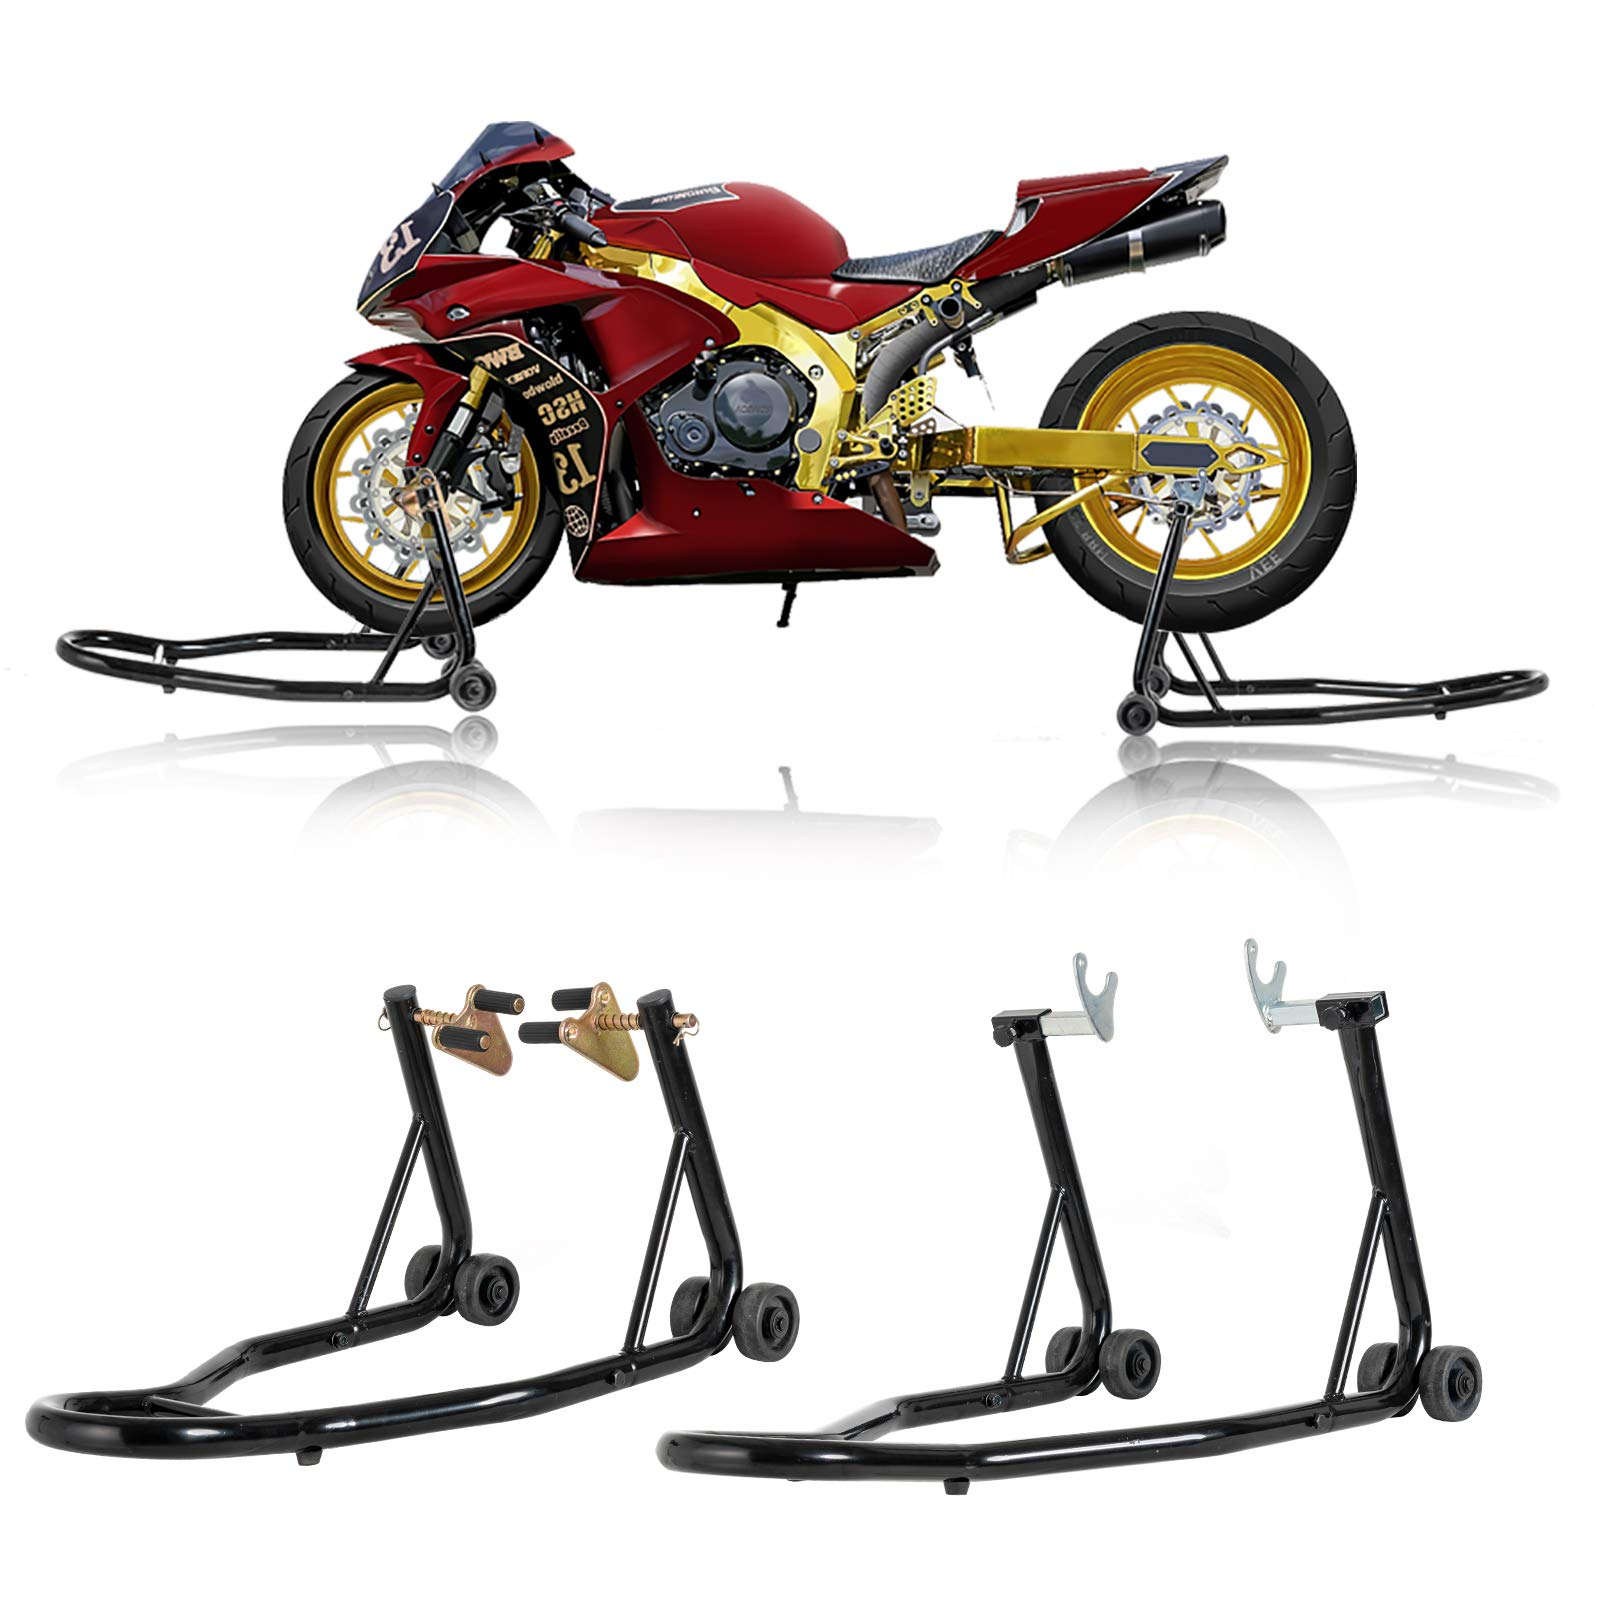 SUNCOO Pair Motorcycle Stands Front & Rear Wheel Lift Stand Set Paddock W/Swingarm Fork Spool Lift for Honda Yamaha BMW Motorbike Sport Bike Maintenance, Black by SUNCOO